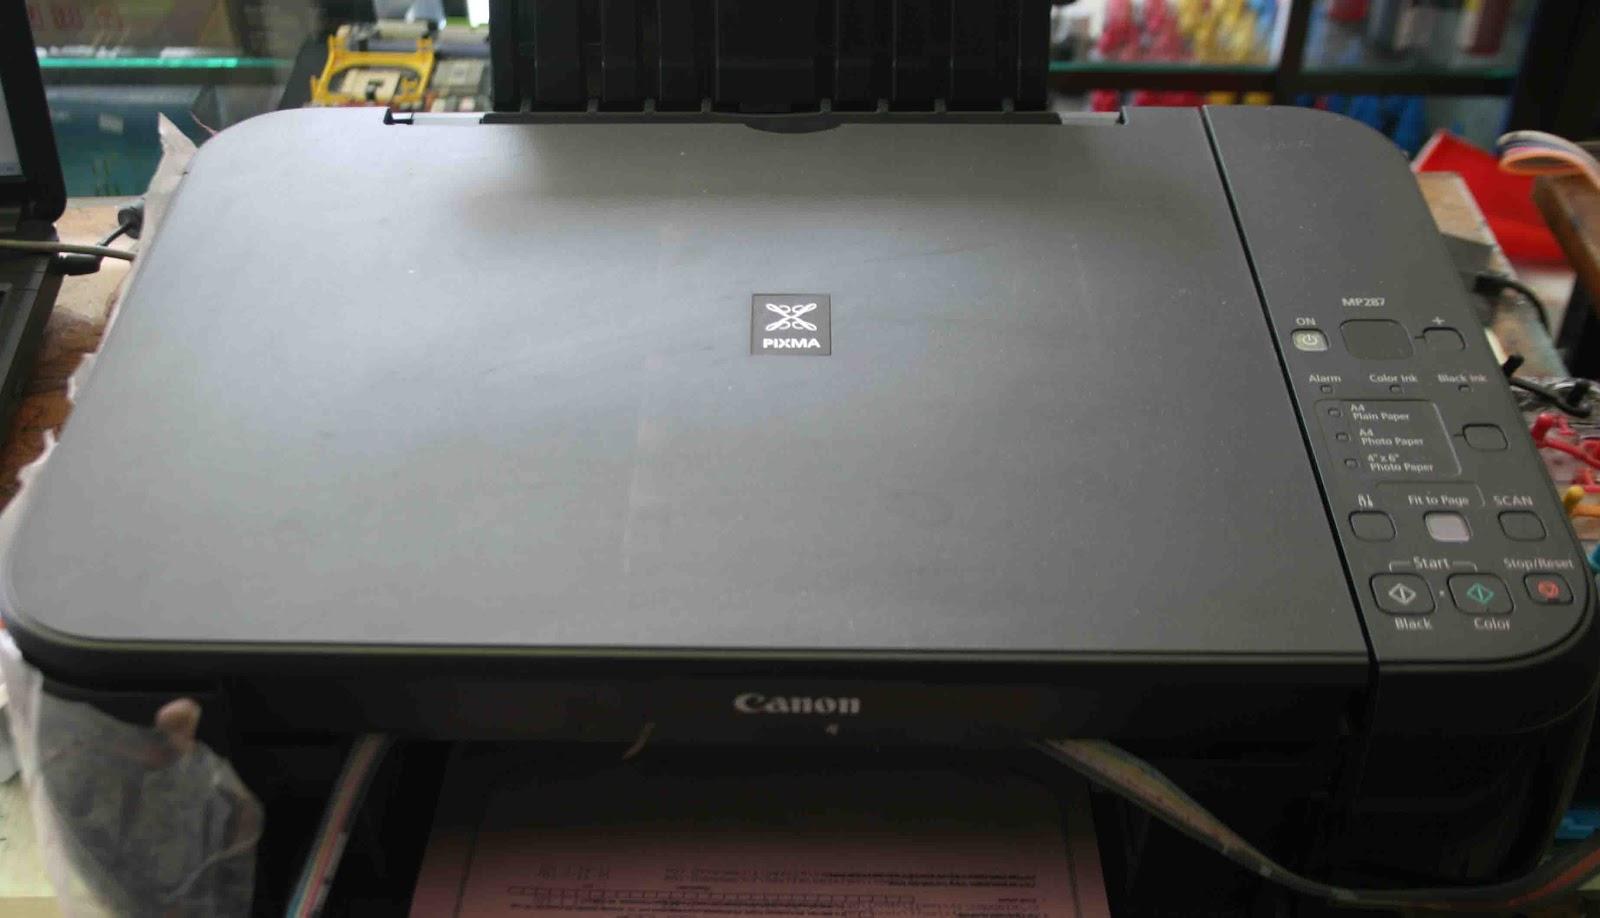 Boedjhank Crew Computer Cara Mengatasi Canon Mp287 Eror P03 Eror 6000